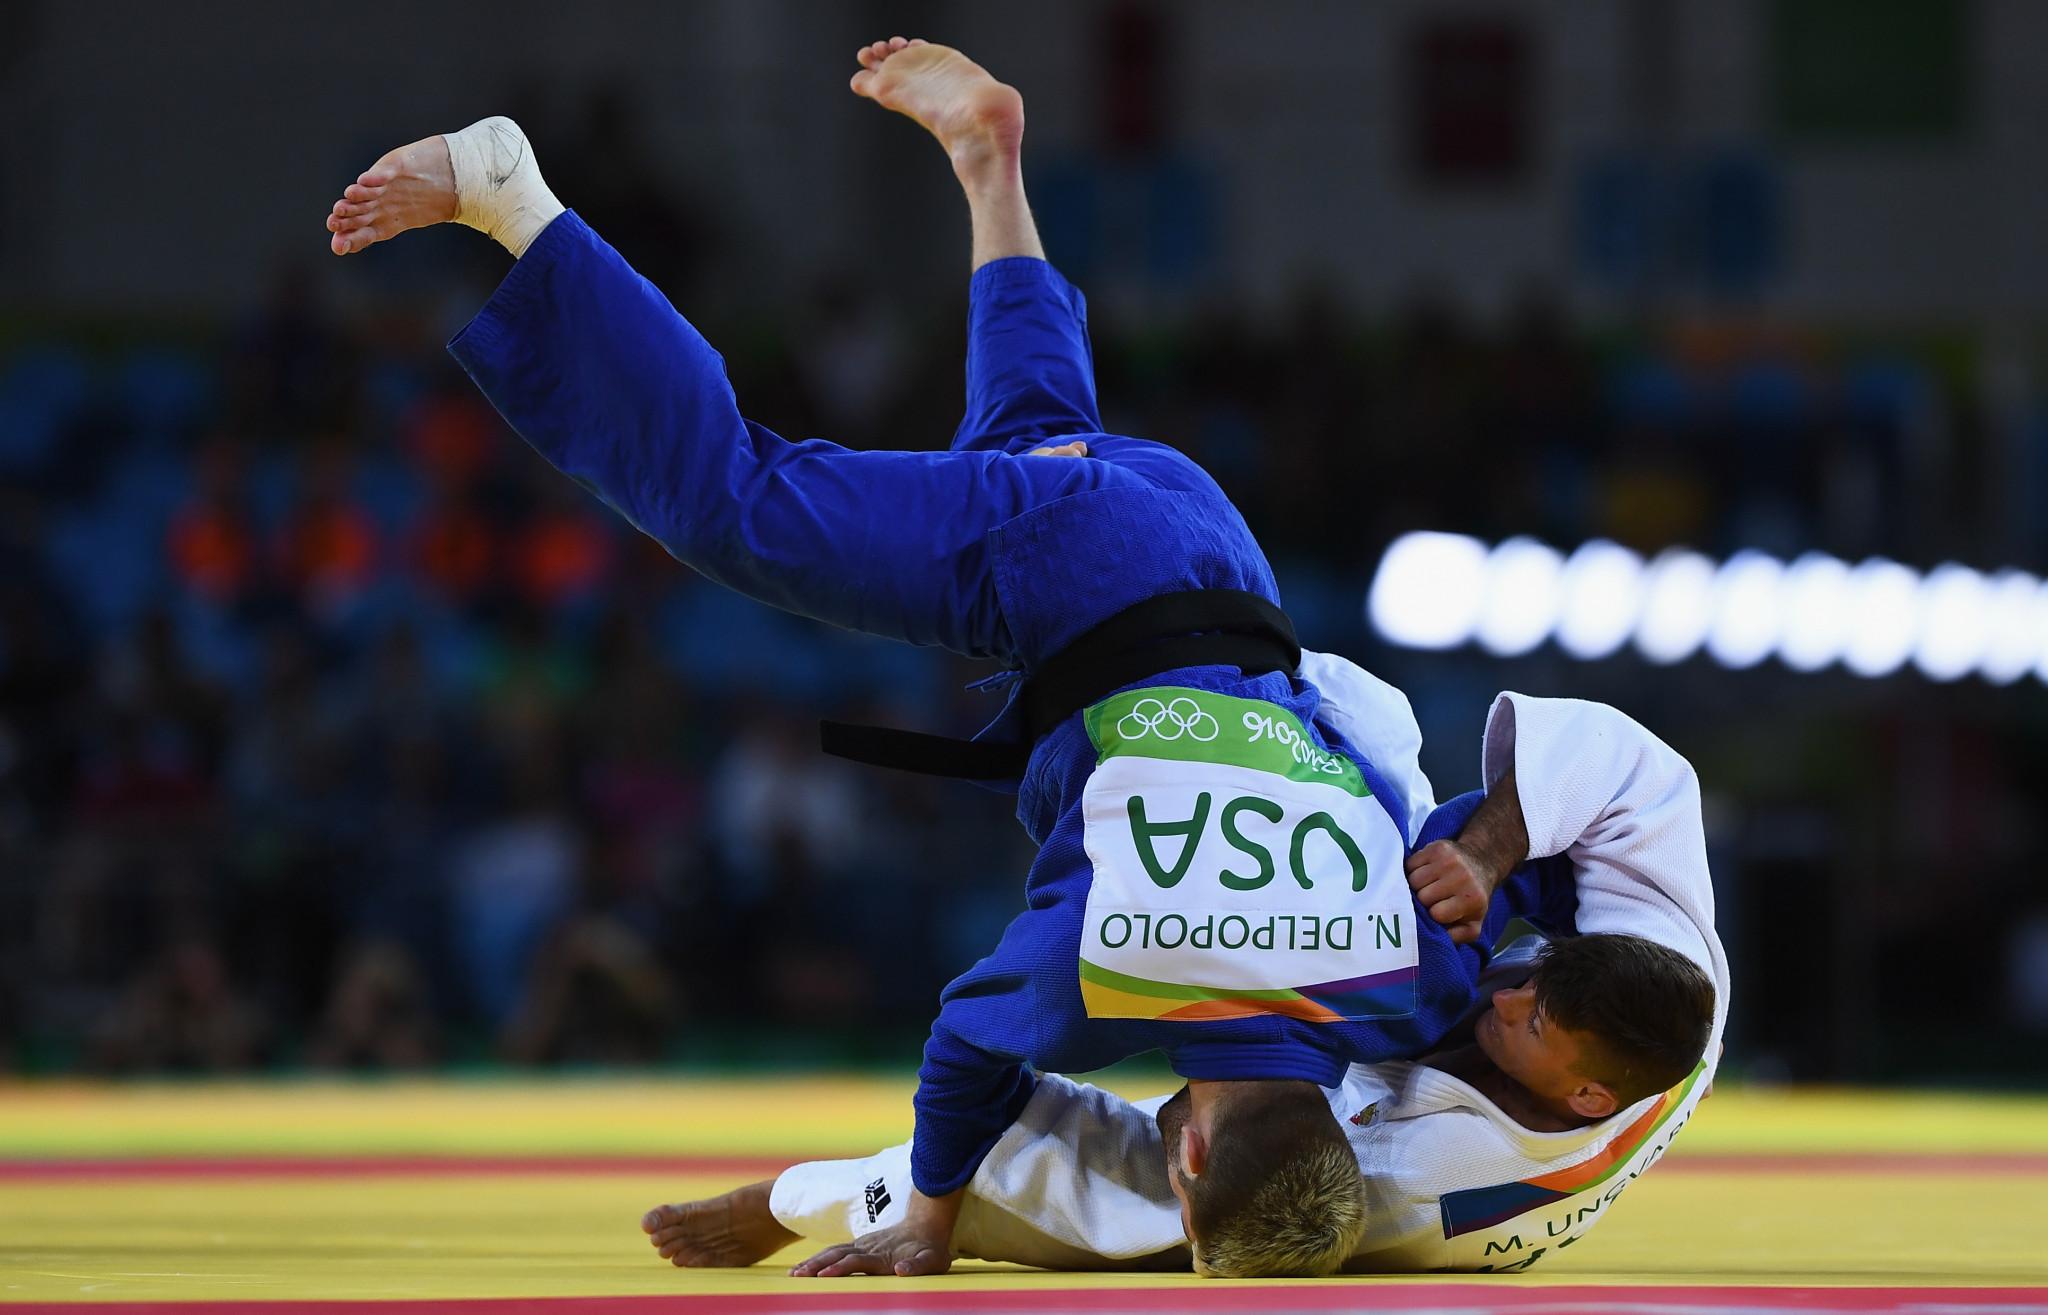 USA Judo award 2020 Senior National Championships to Daytona